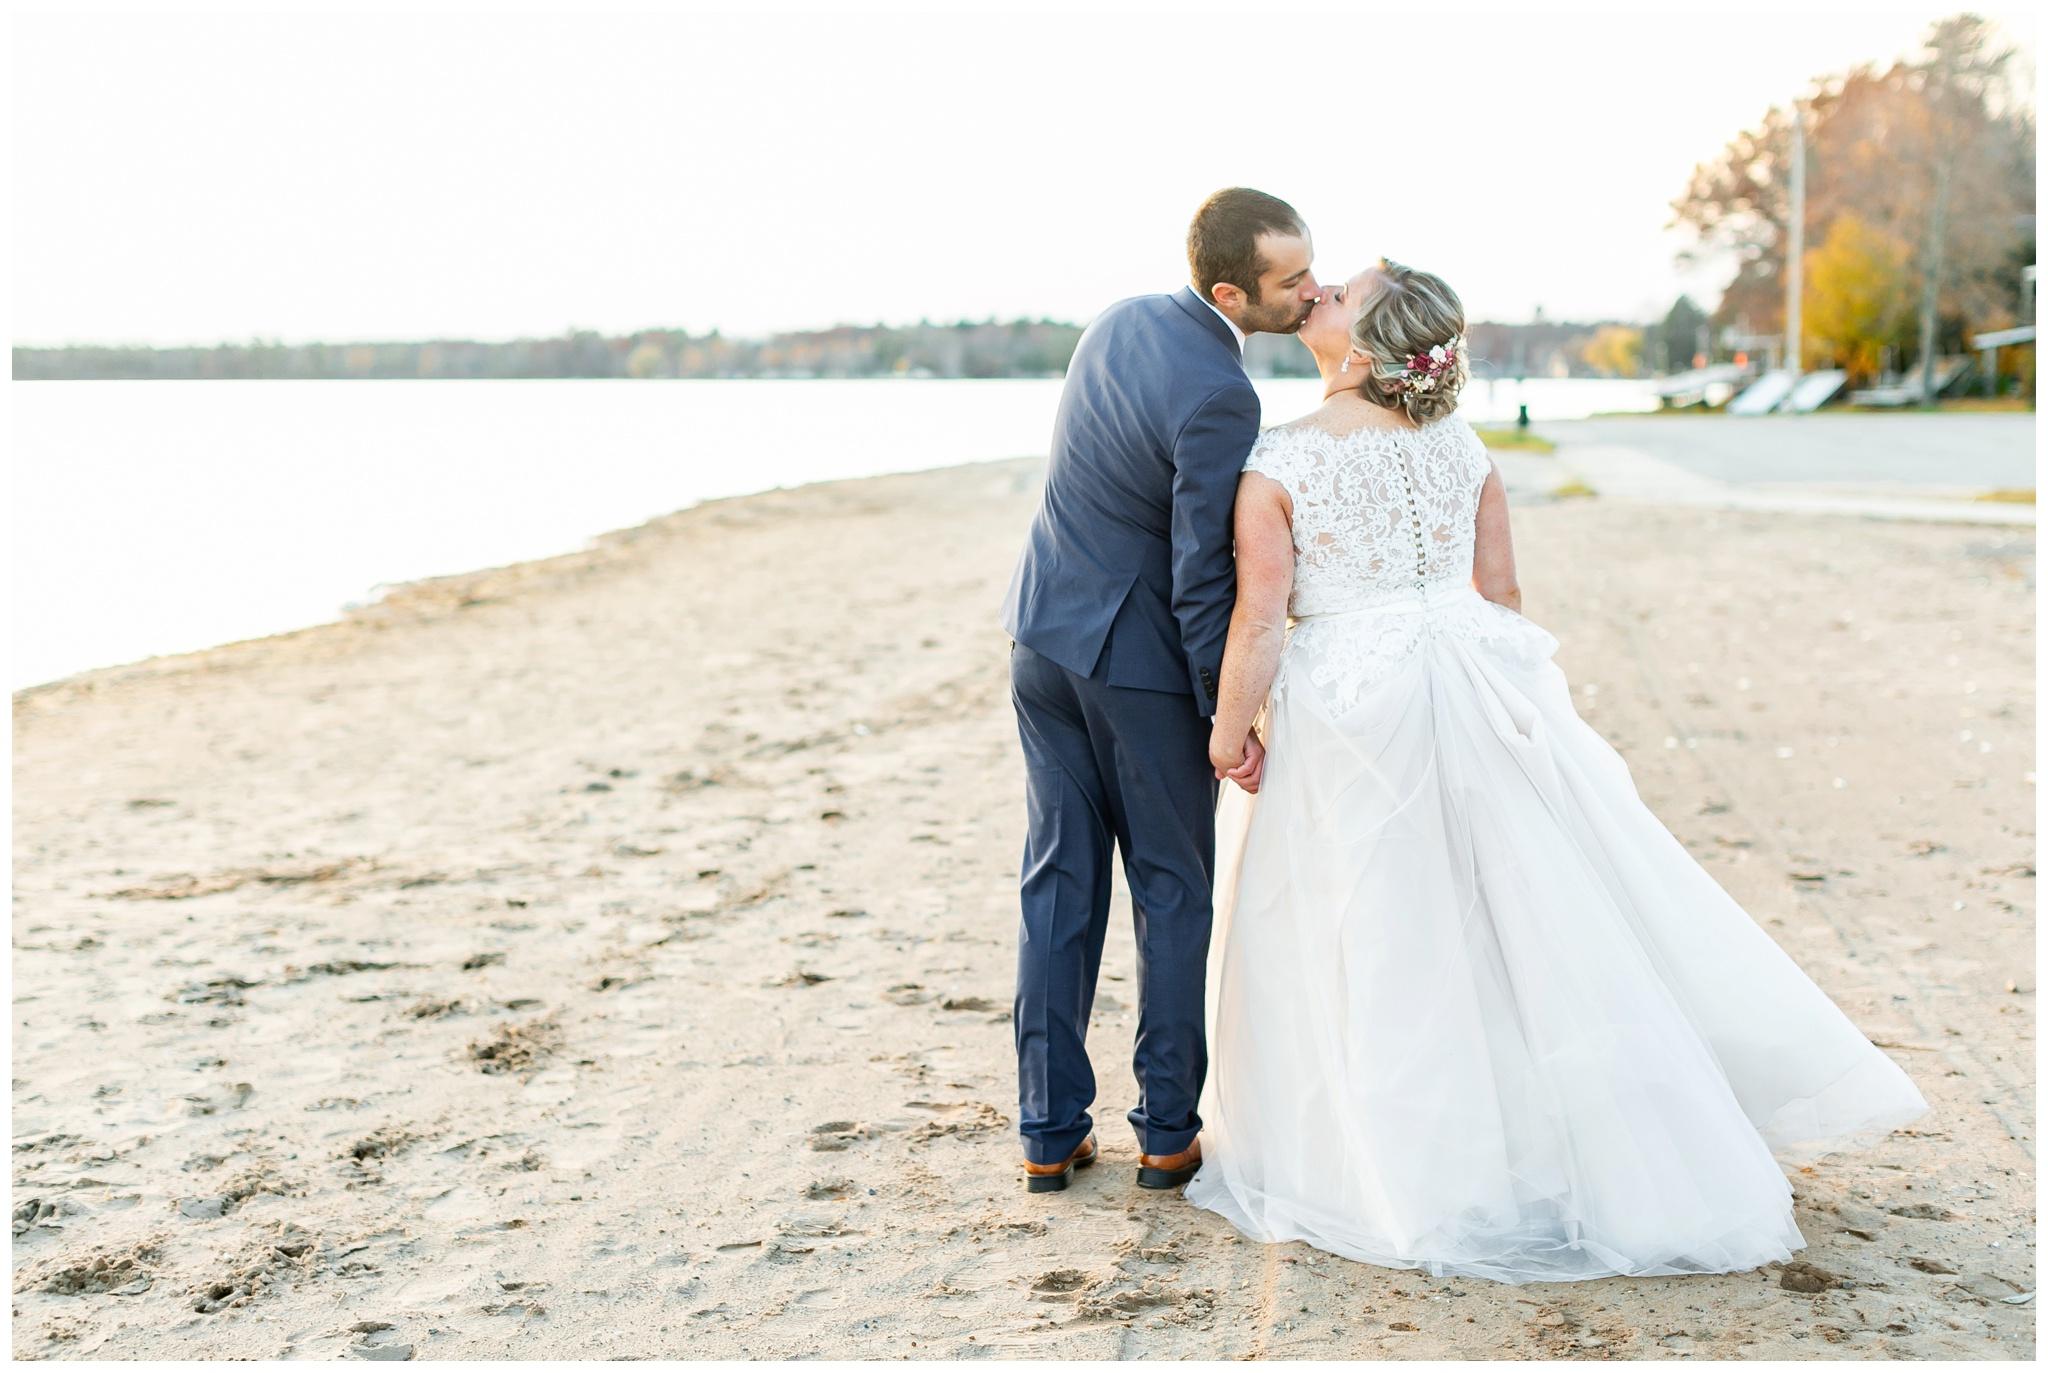 Shawano_County_park_Wedding_Caynay_Photo_Madison_Wi_2348.jpg